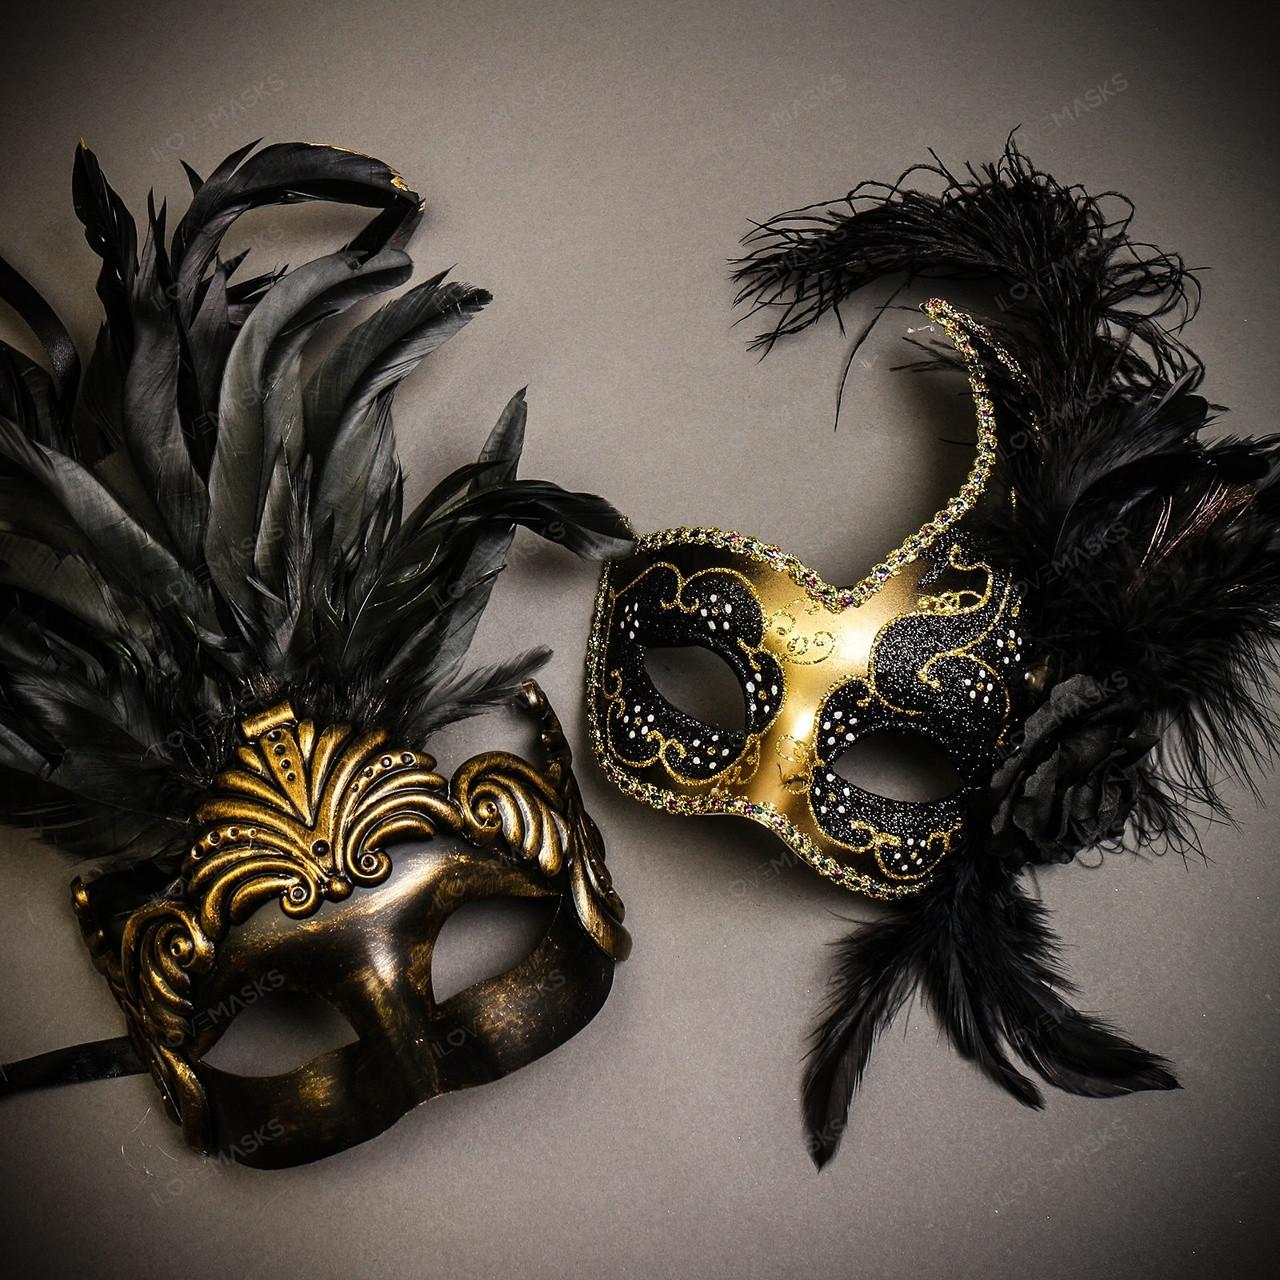 Men /& Women Party Couple Masks Set Feather Masquerade Prom Costume Mask Black